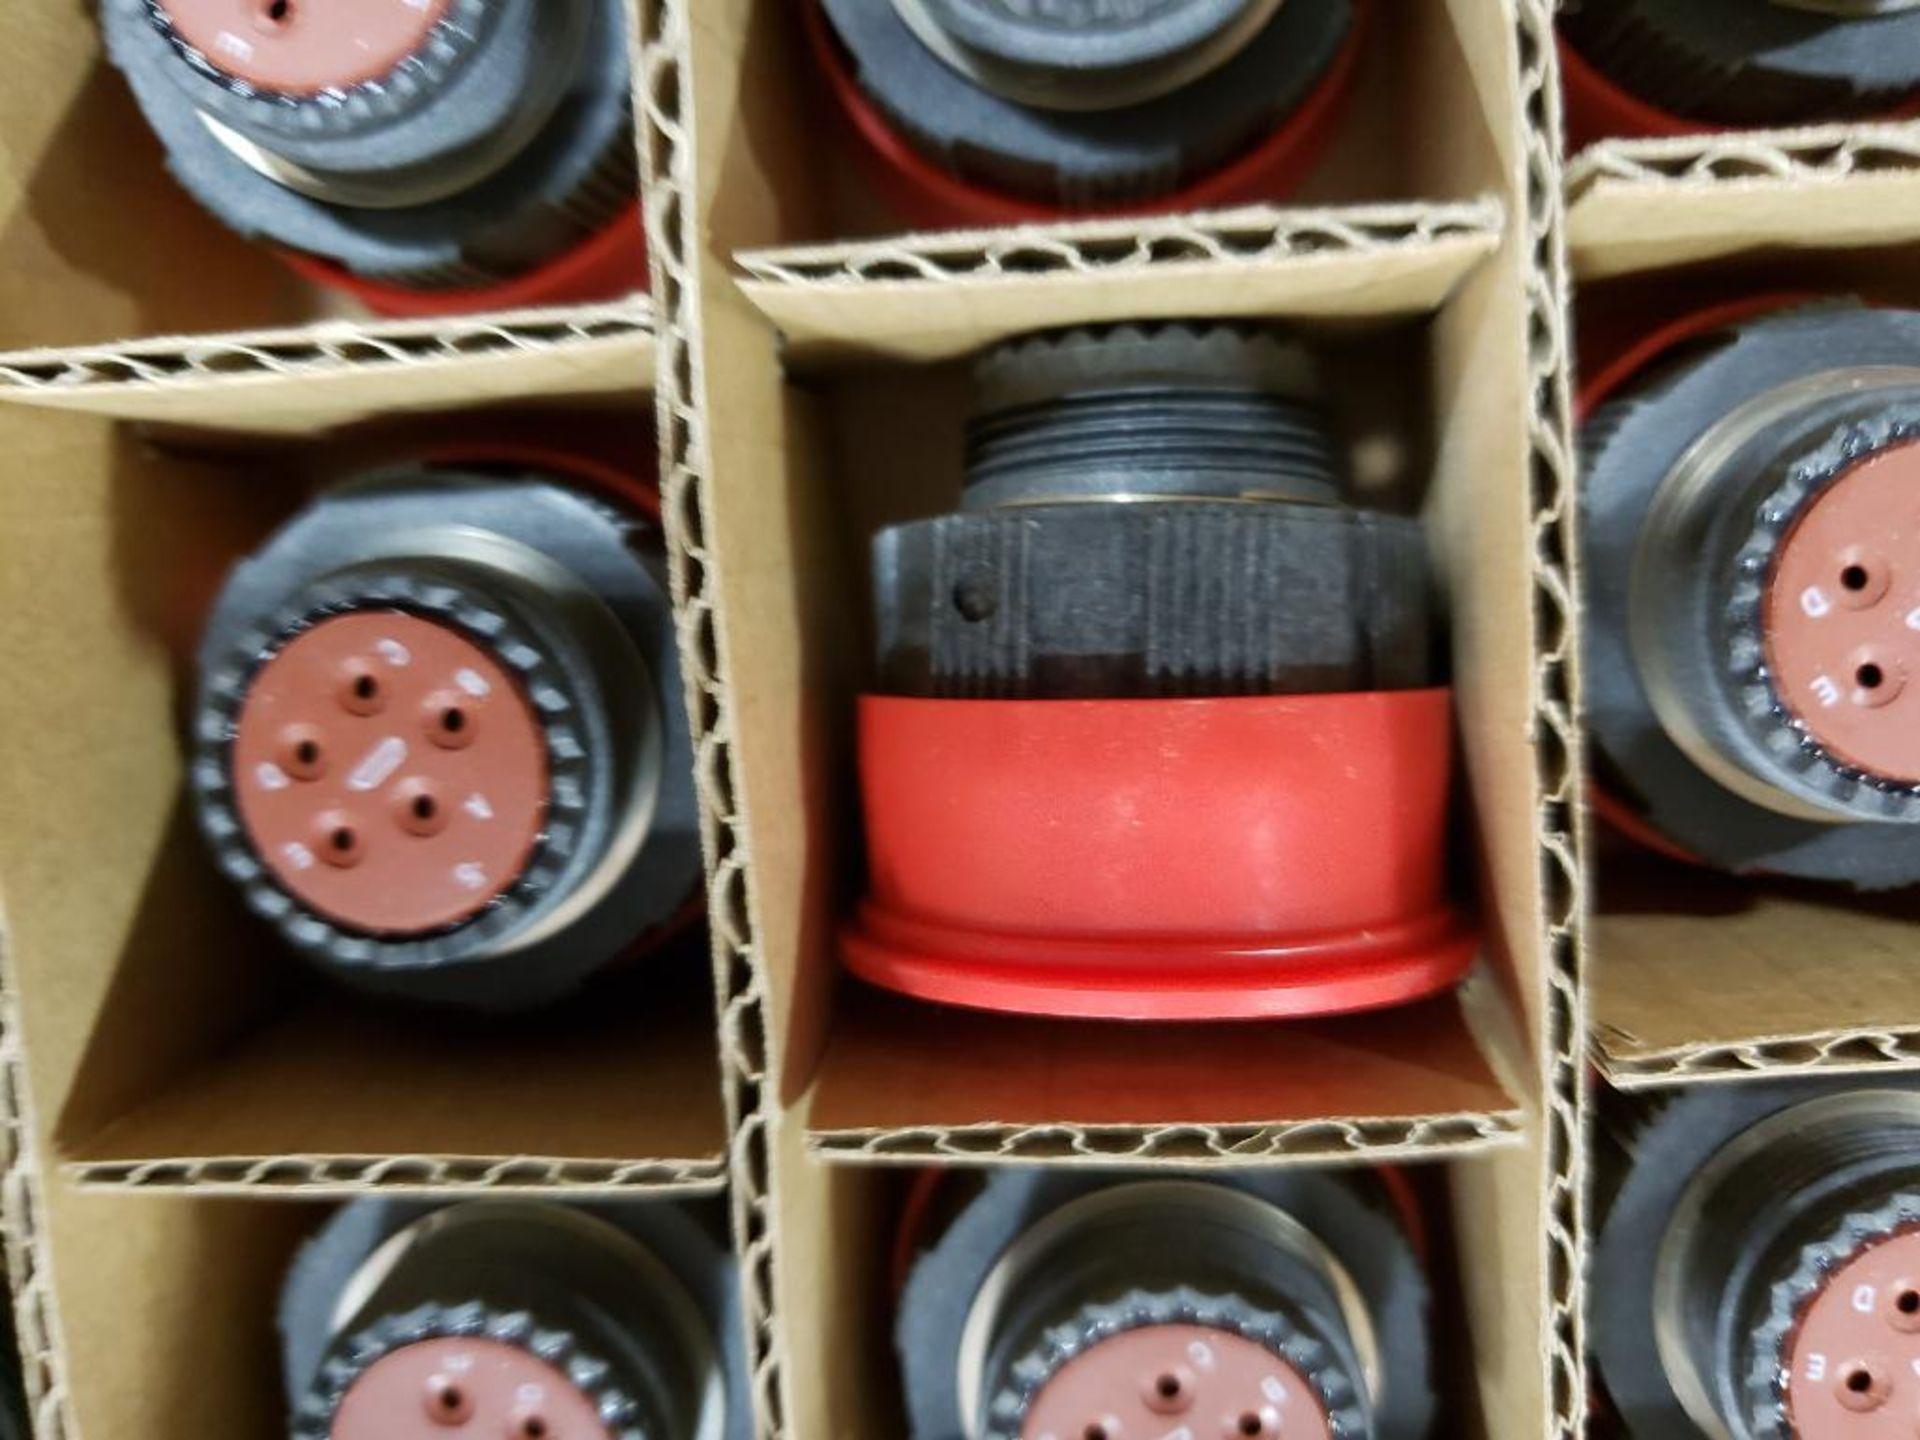 Qty 41 - Amphenol CUA-611554-05P plug connector. - Image 2 of 4